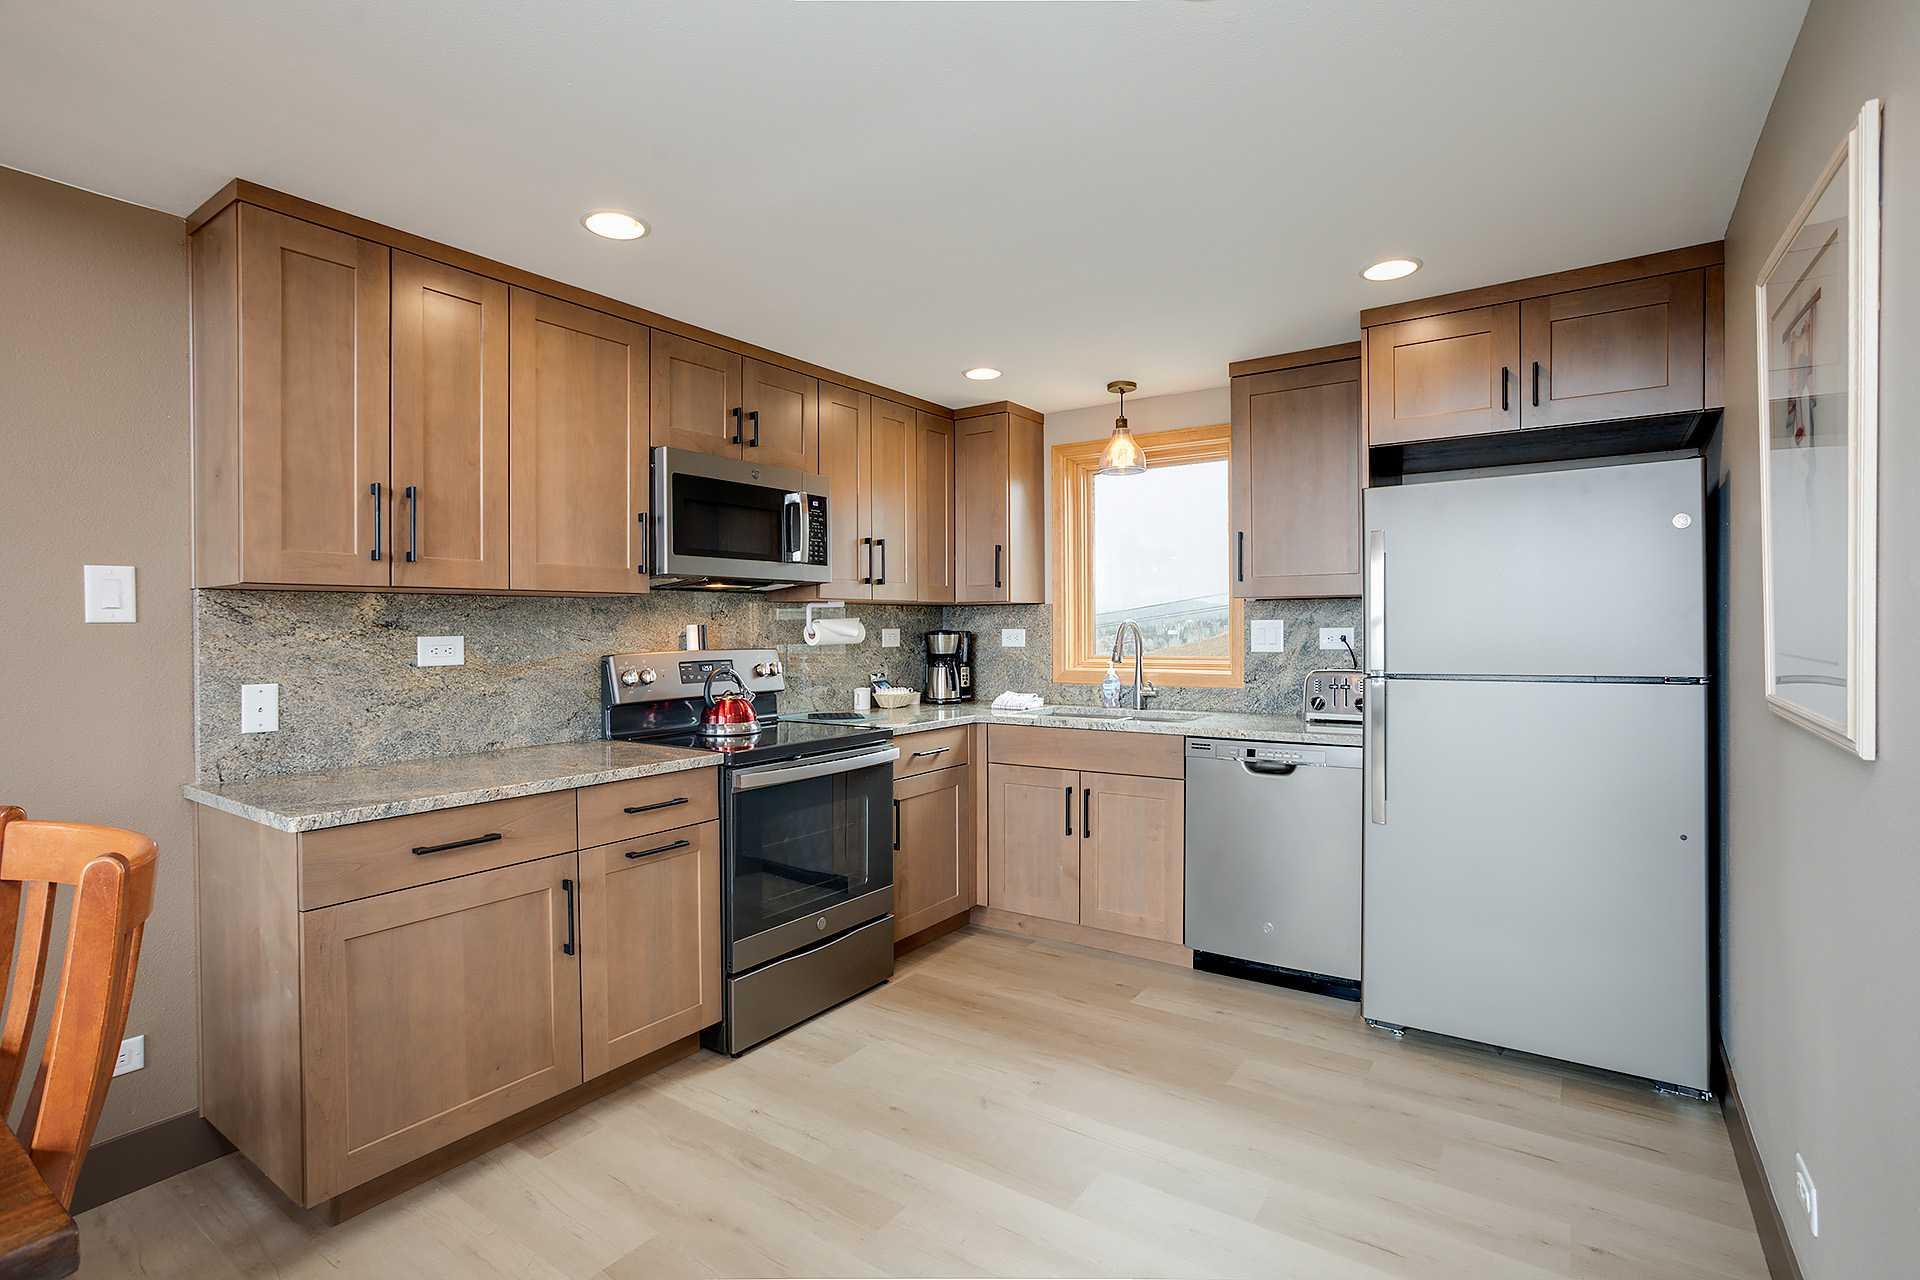 W3324: The West Condominiums